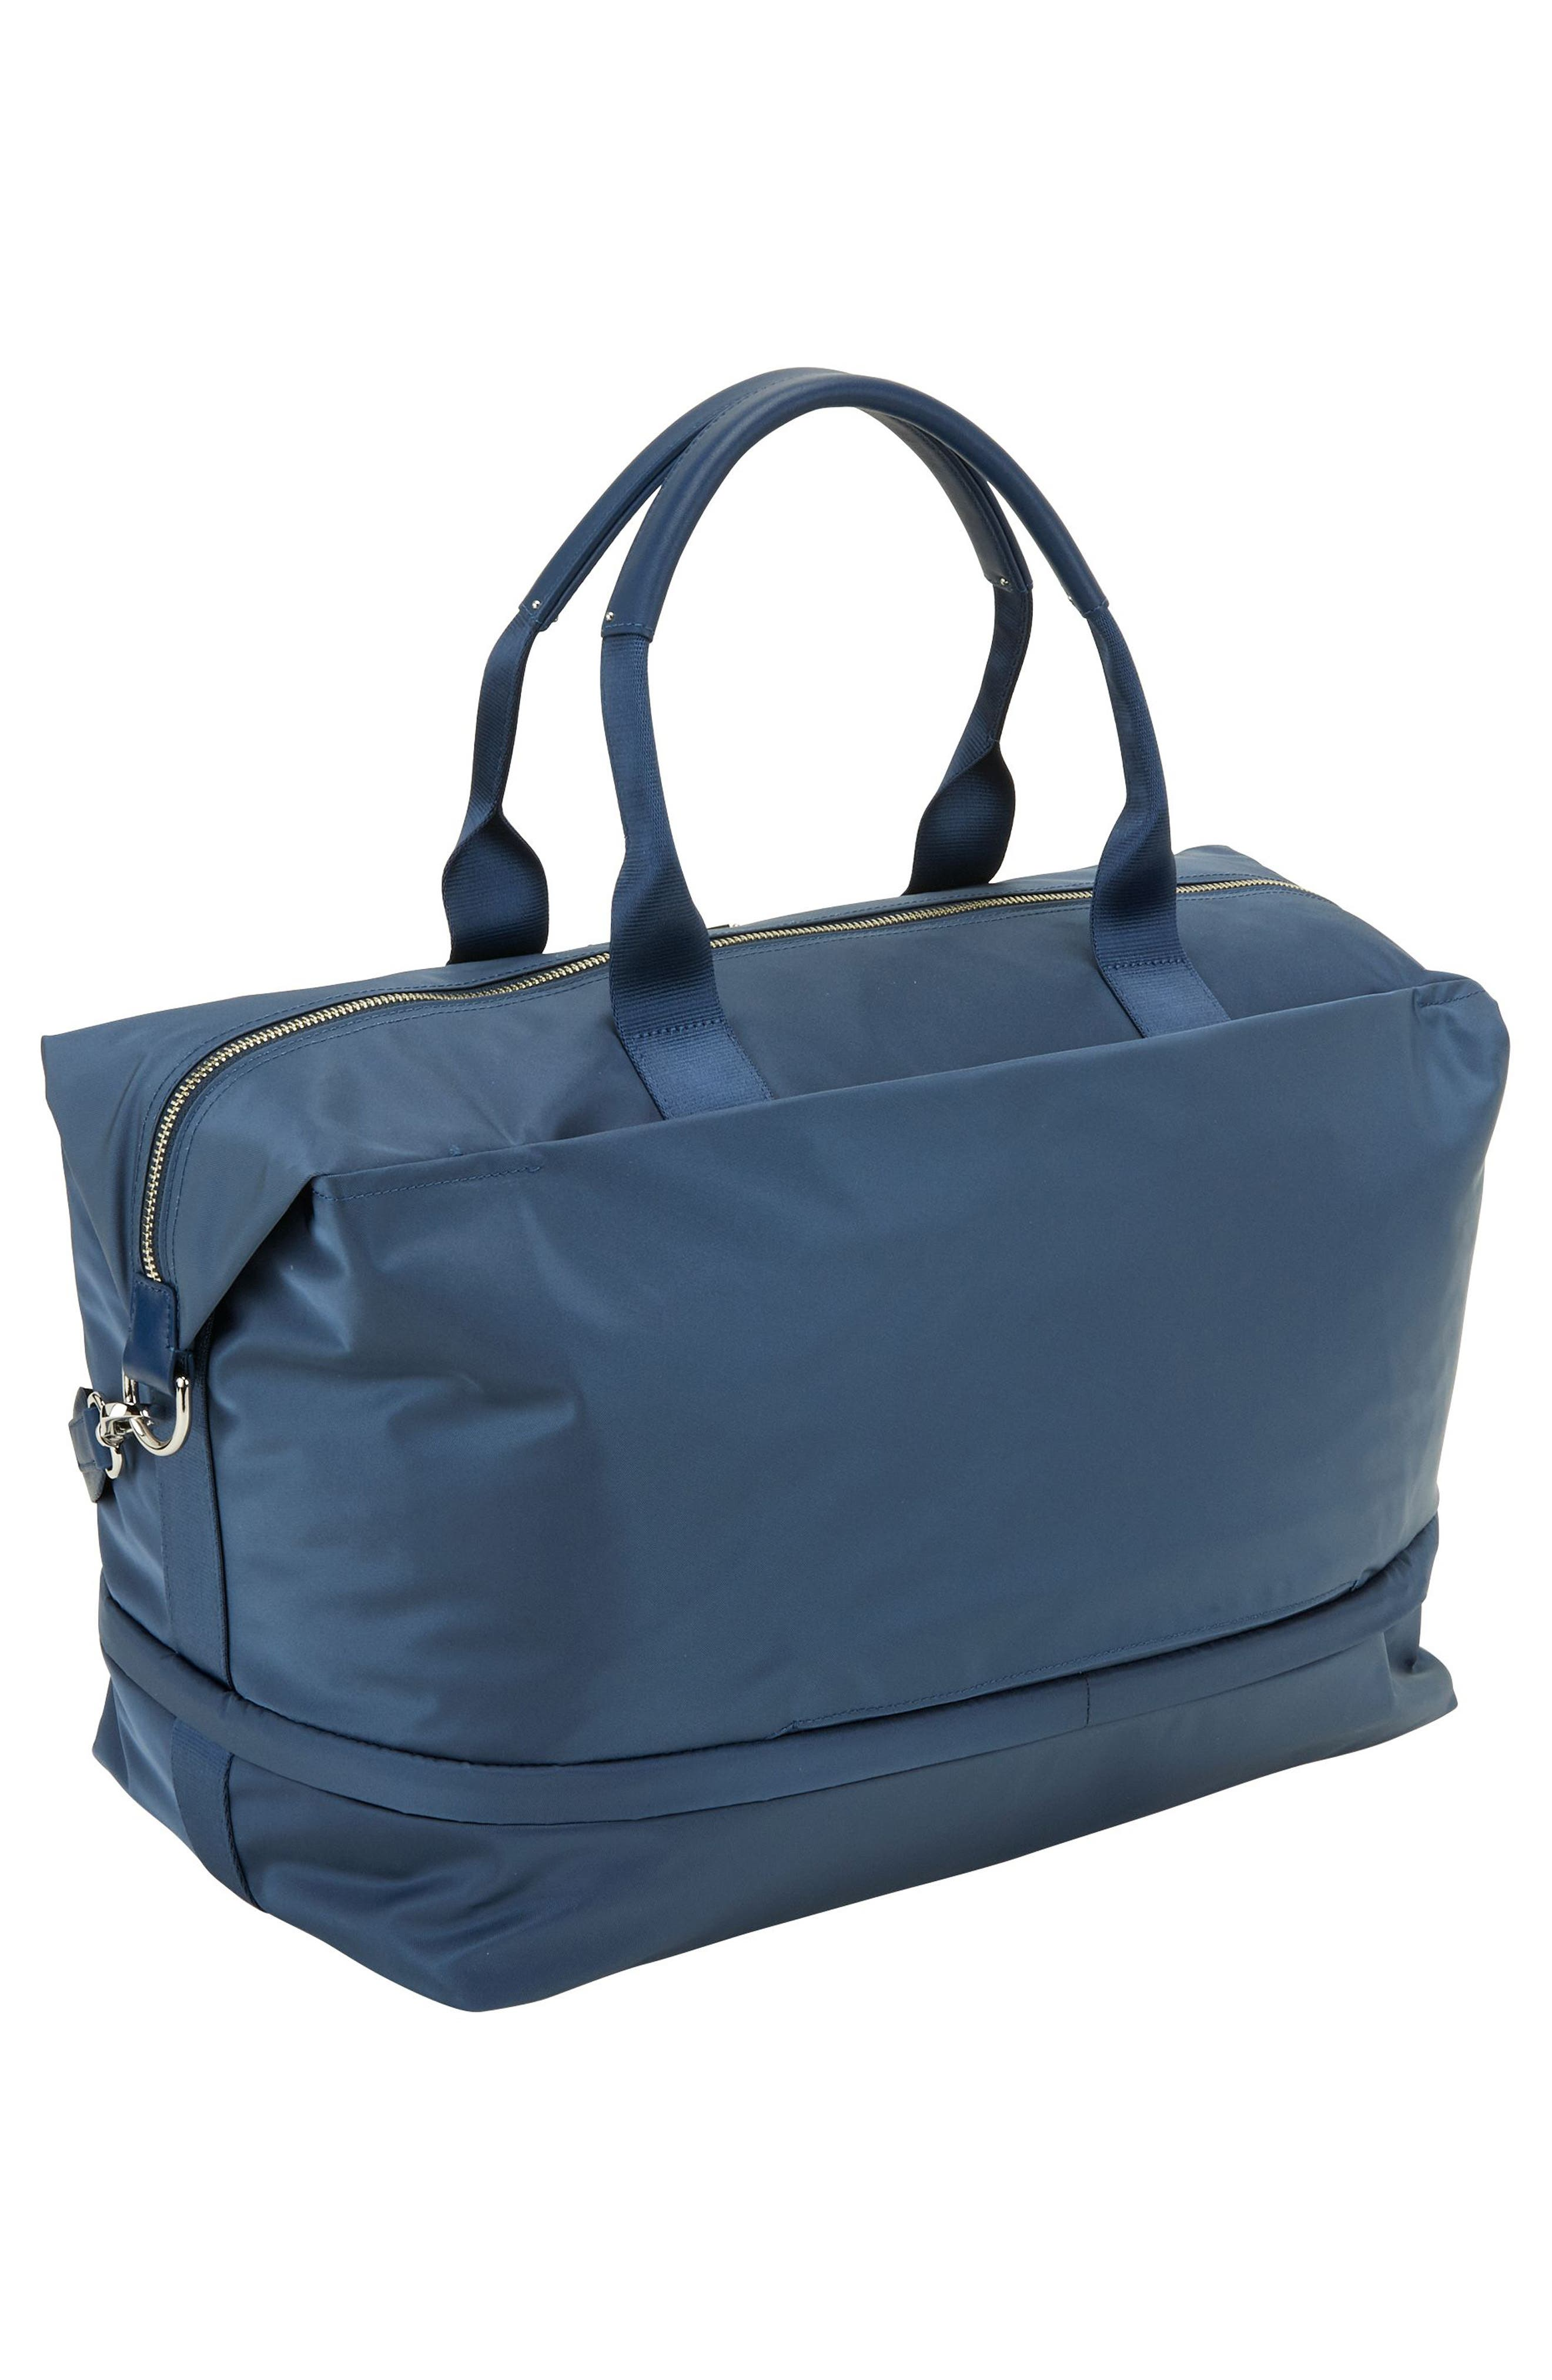 Durban Expandable Duffel Bag,                             Alternate thumbnail 6, color,